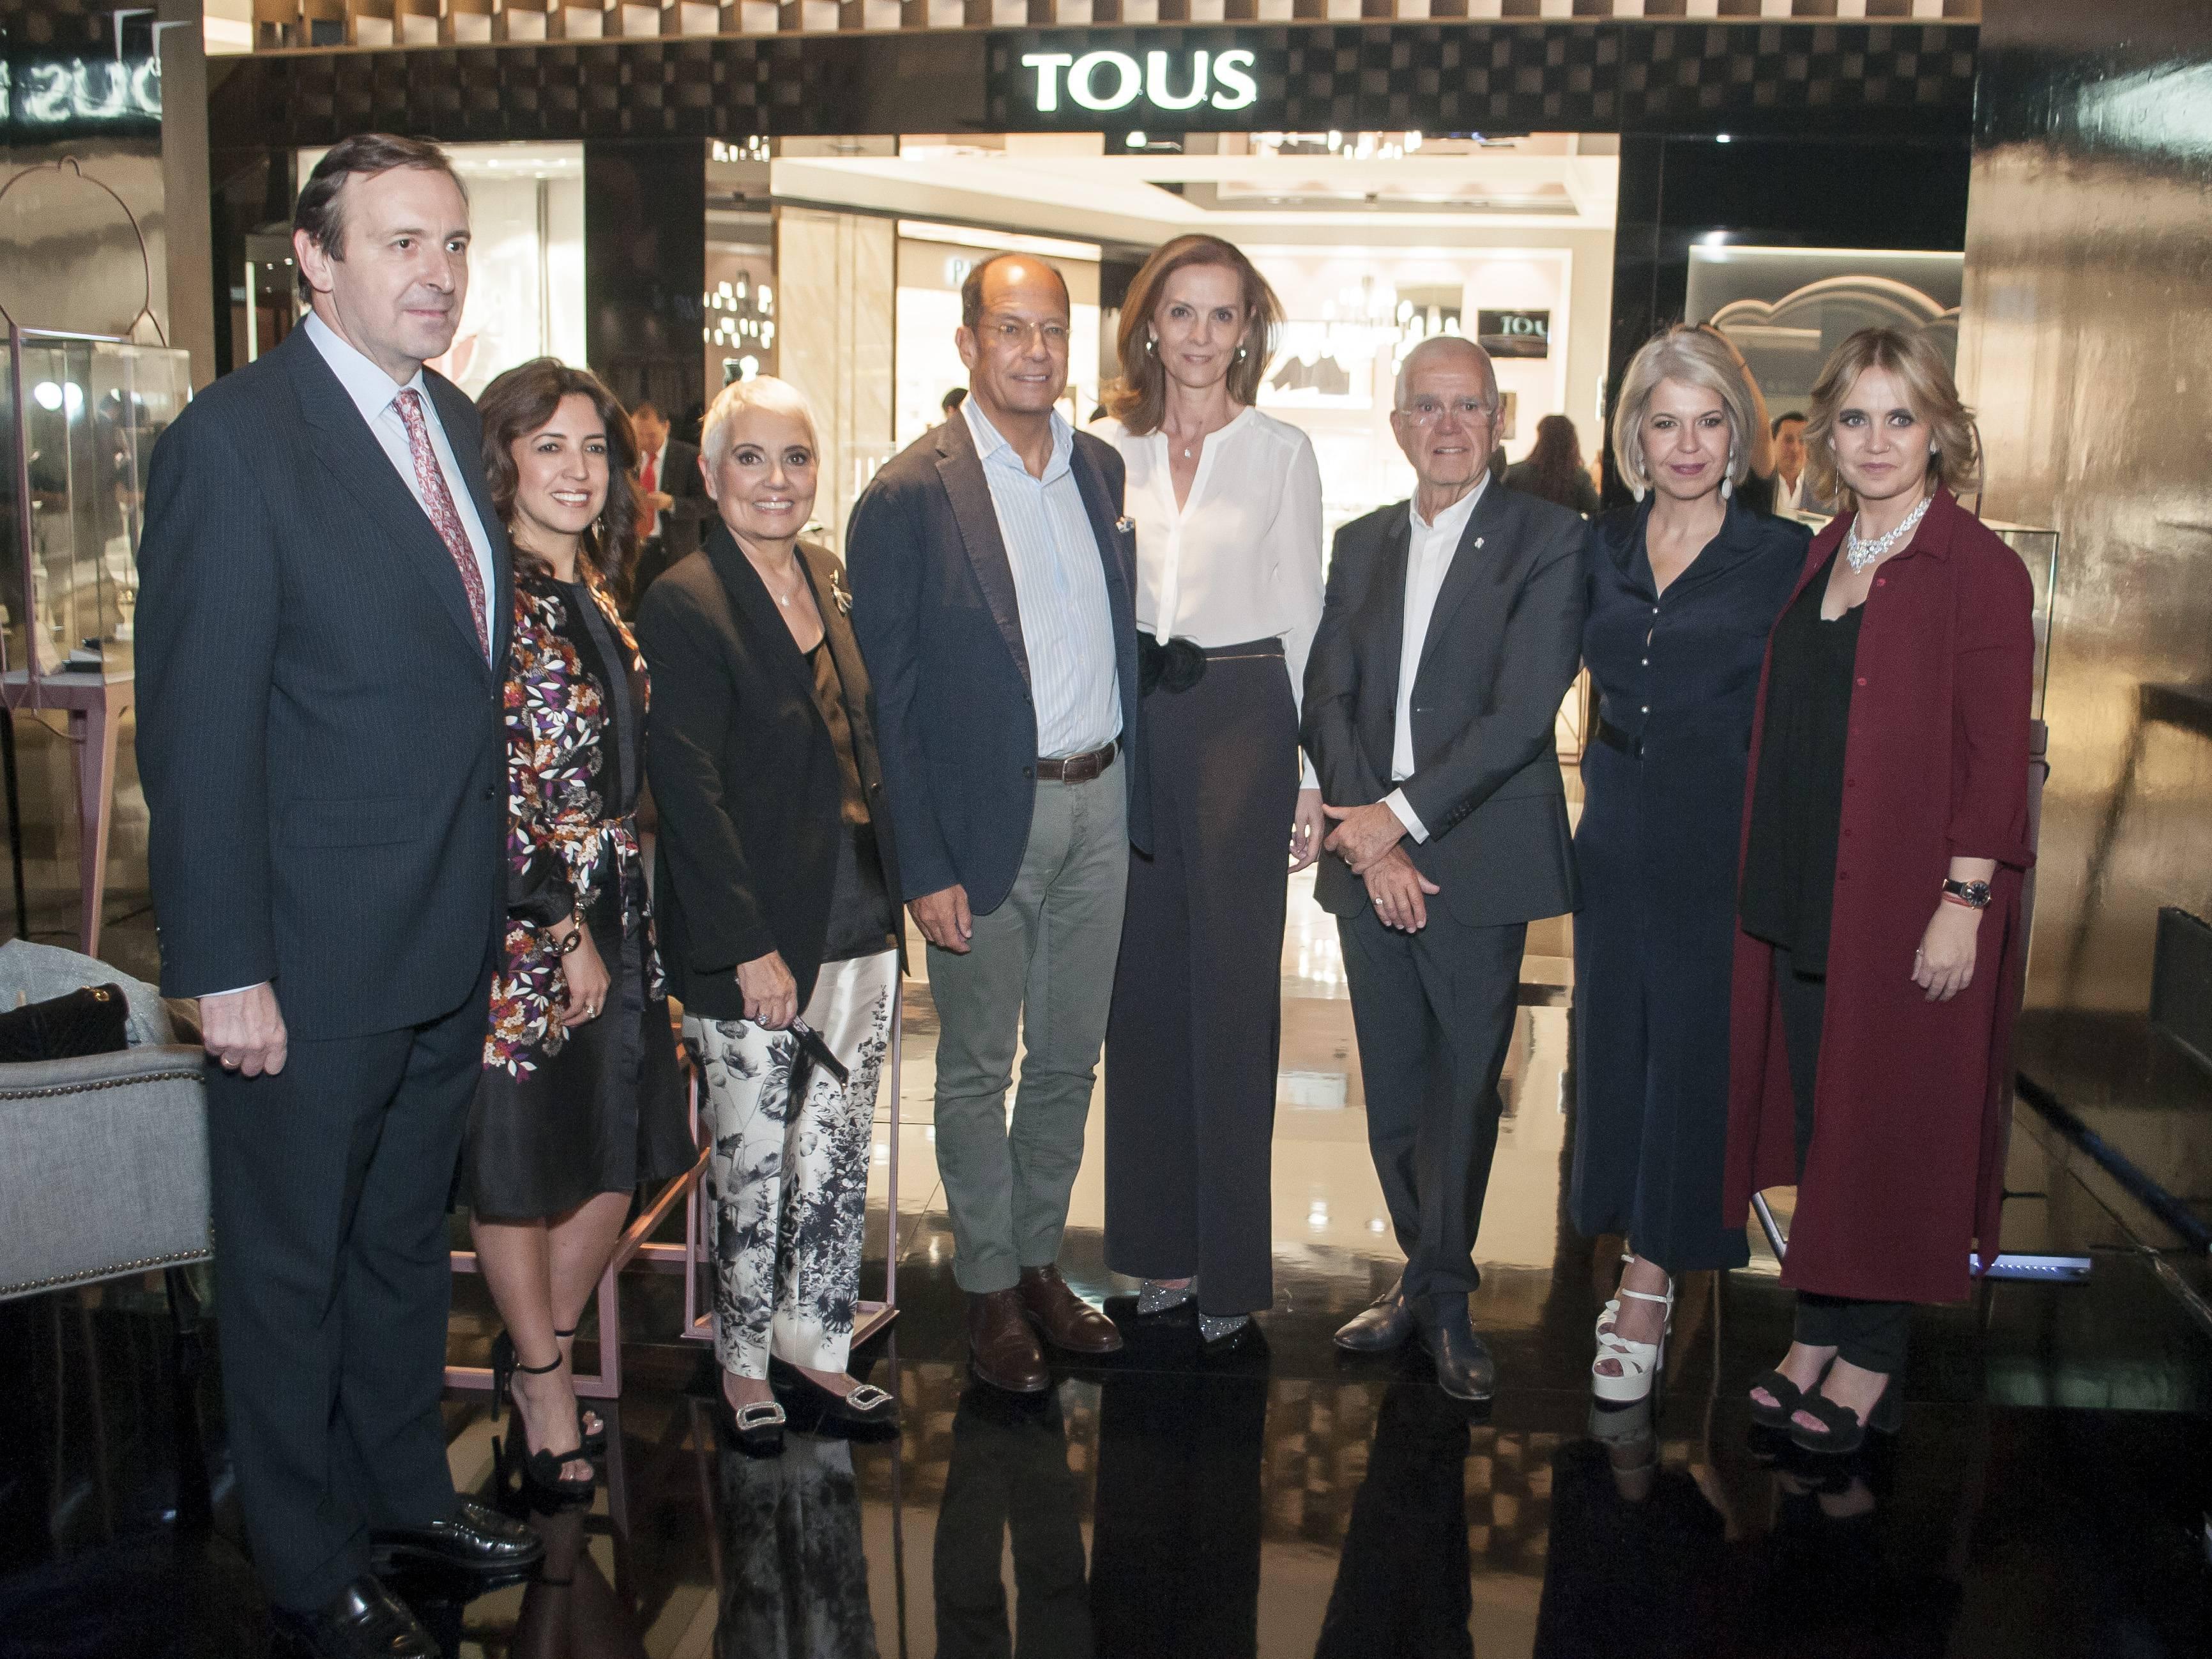 Luis Fernández, Claudia Fabel, Rosa Oriol, Juan Carlos Escribano, Ana López Ocaña, Salvador Tous , Alba Tous y Rosa Tous JDS